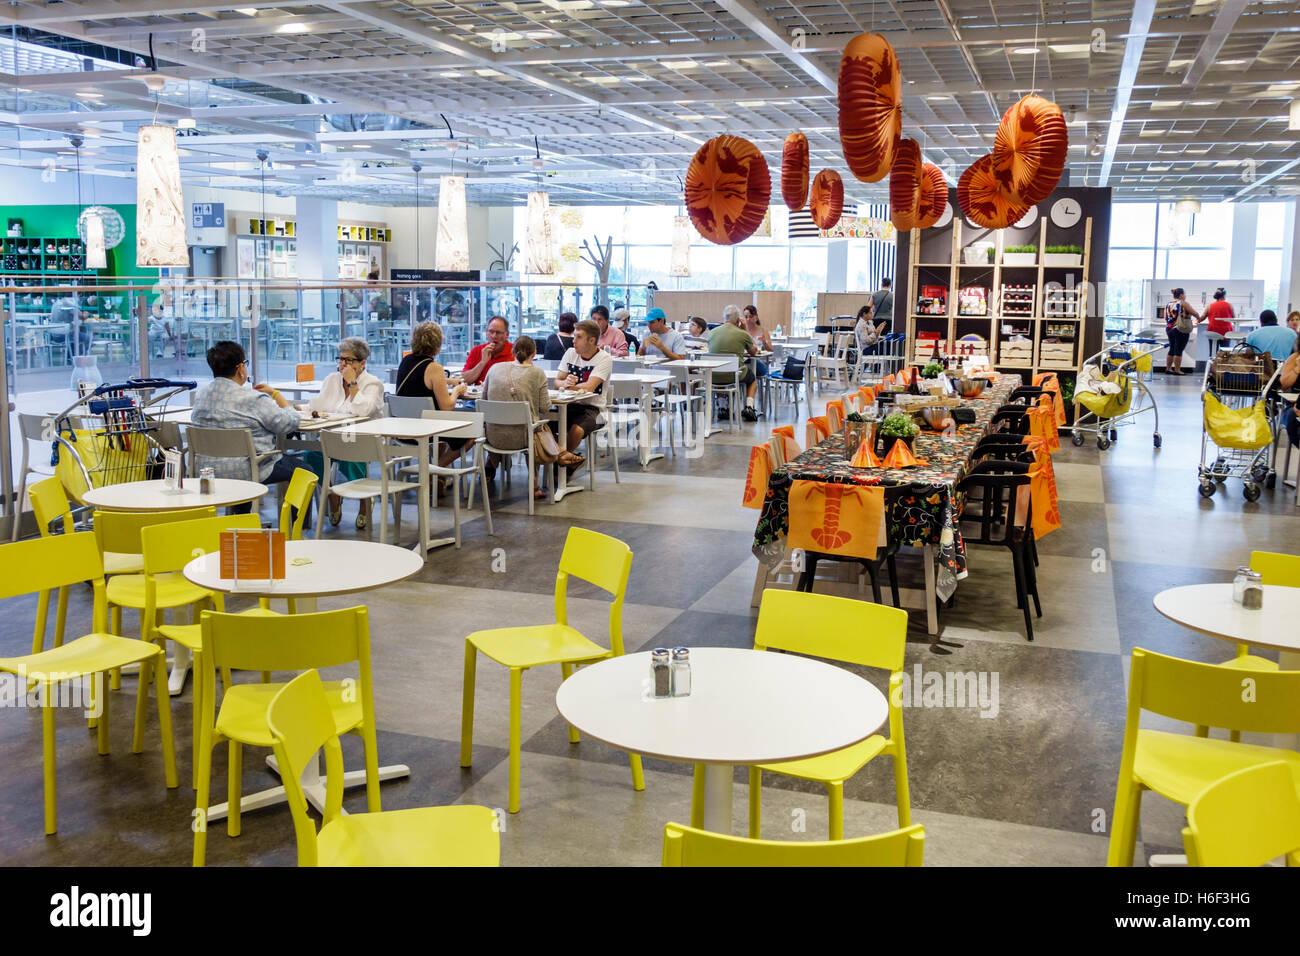 Table De Bistrot Ikea Affordable Table Basse Planche Bois